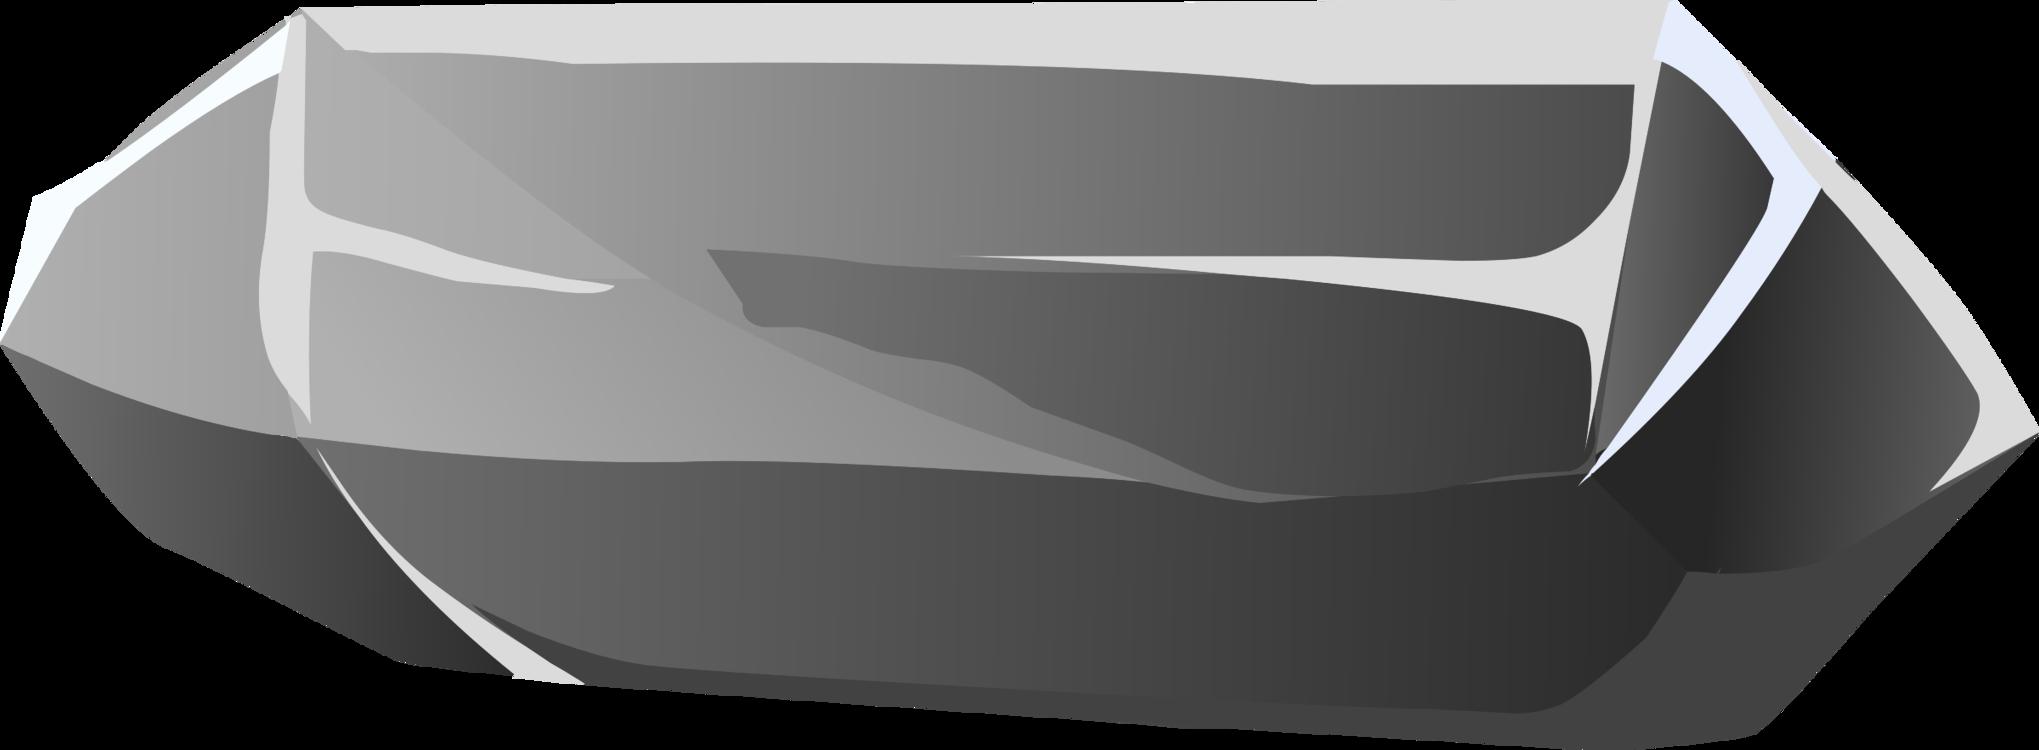 Helmet,Angle,Brand